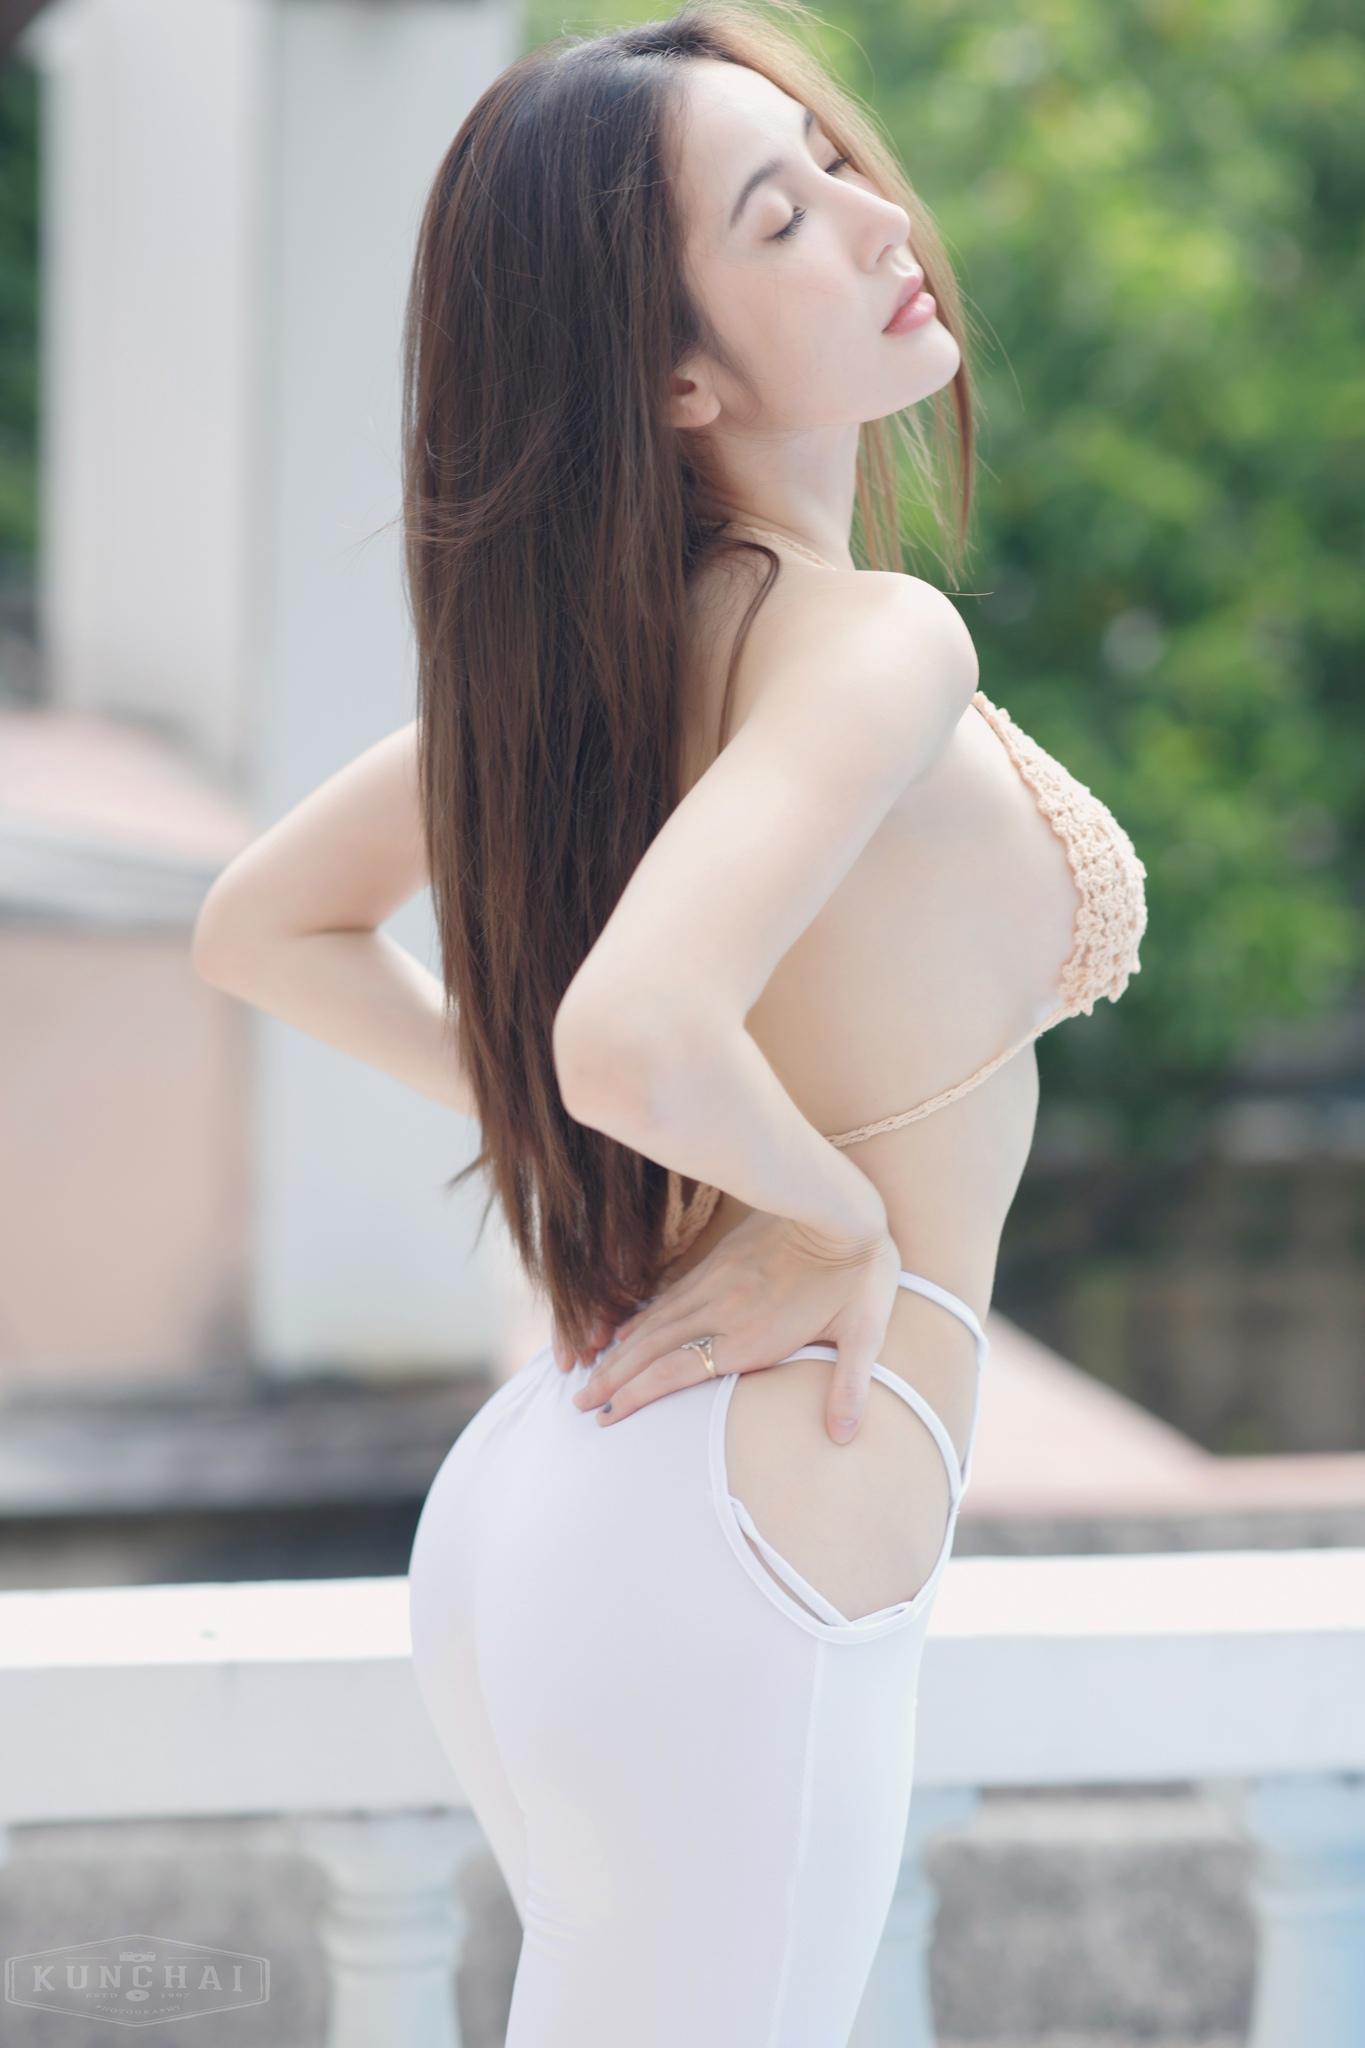 Metita Ritseeboon นางแบบ สวยน่ารัก ขาวเนียนเซ็กซี่ ดูดี หุ่นแซ่บ